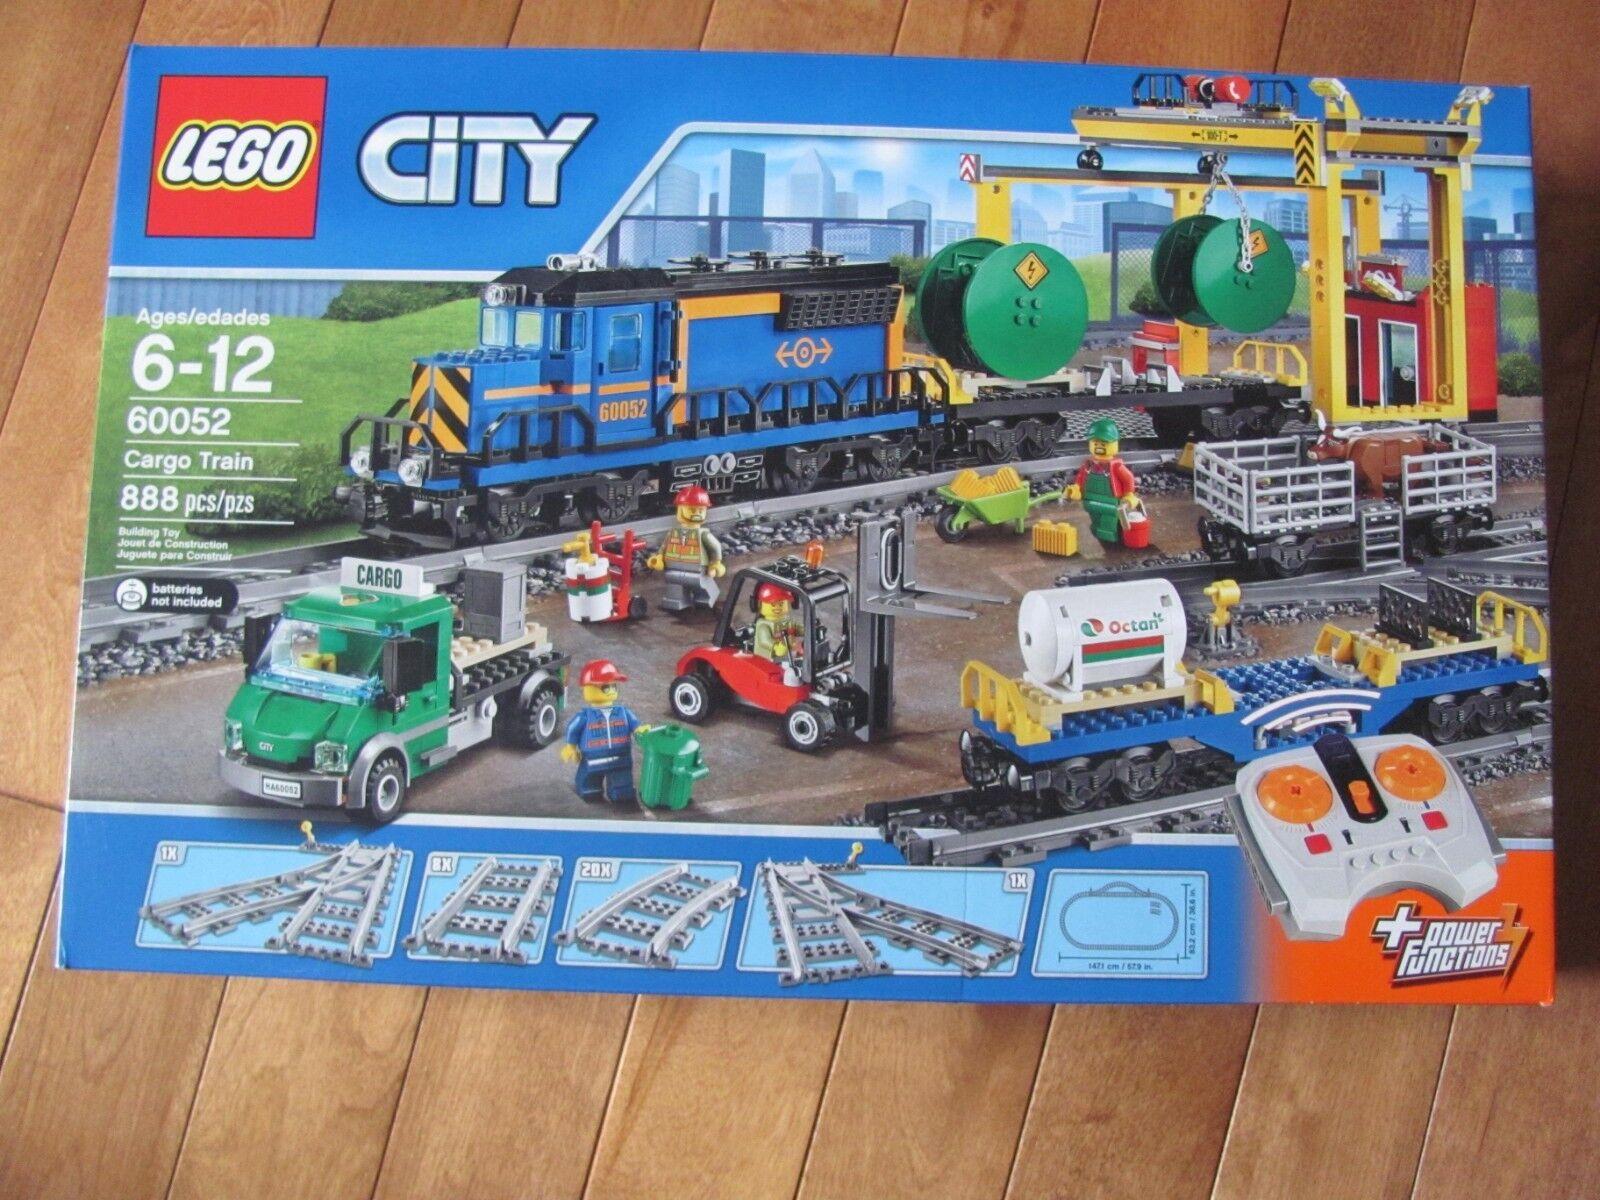 LEGO City  60052 CARGO TRAIN TRAIN TRAIN 888 Pcs RetiROT NEW Sealed 18ad29